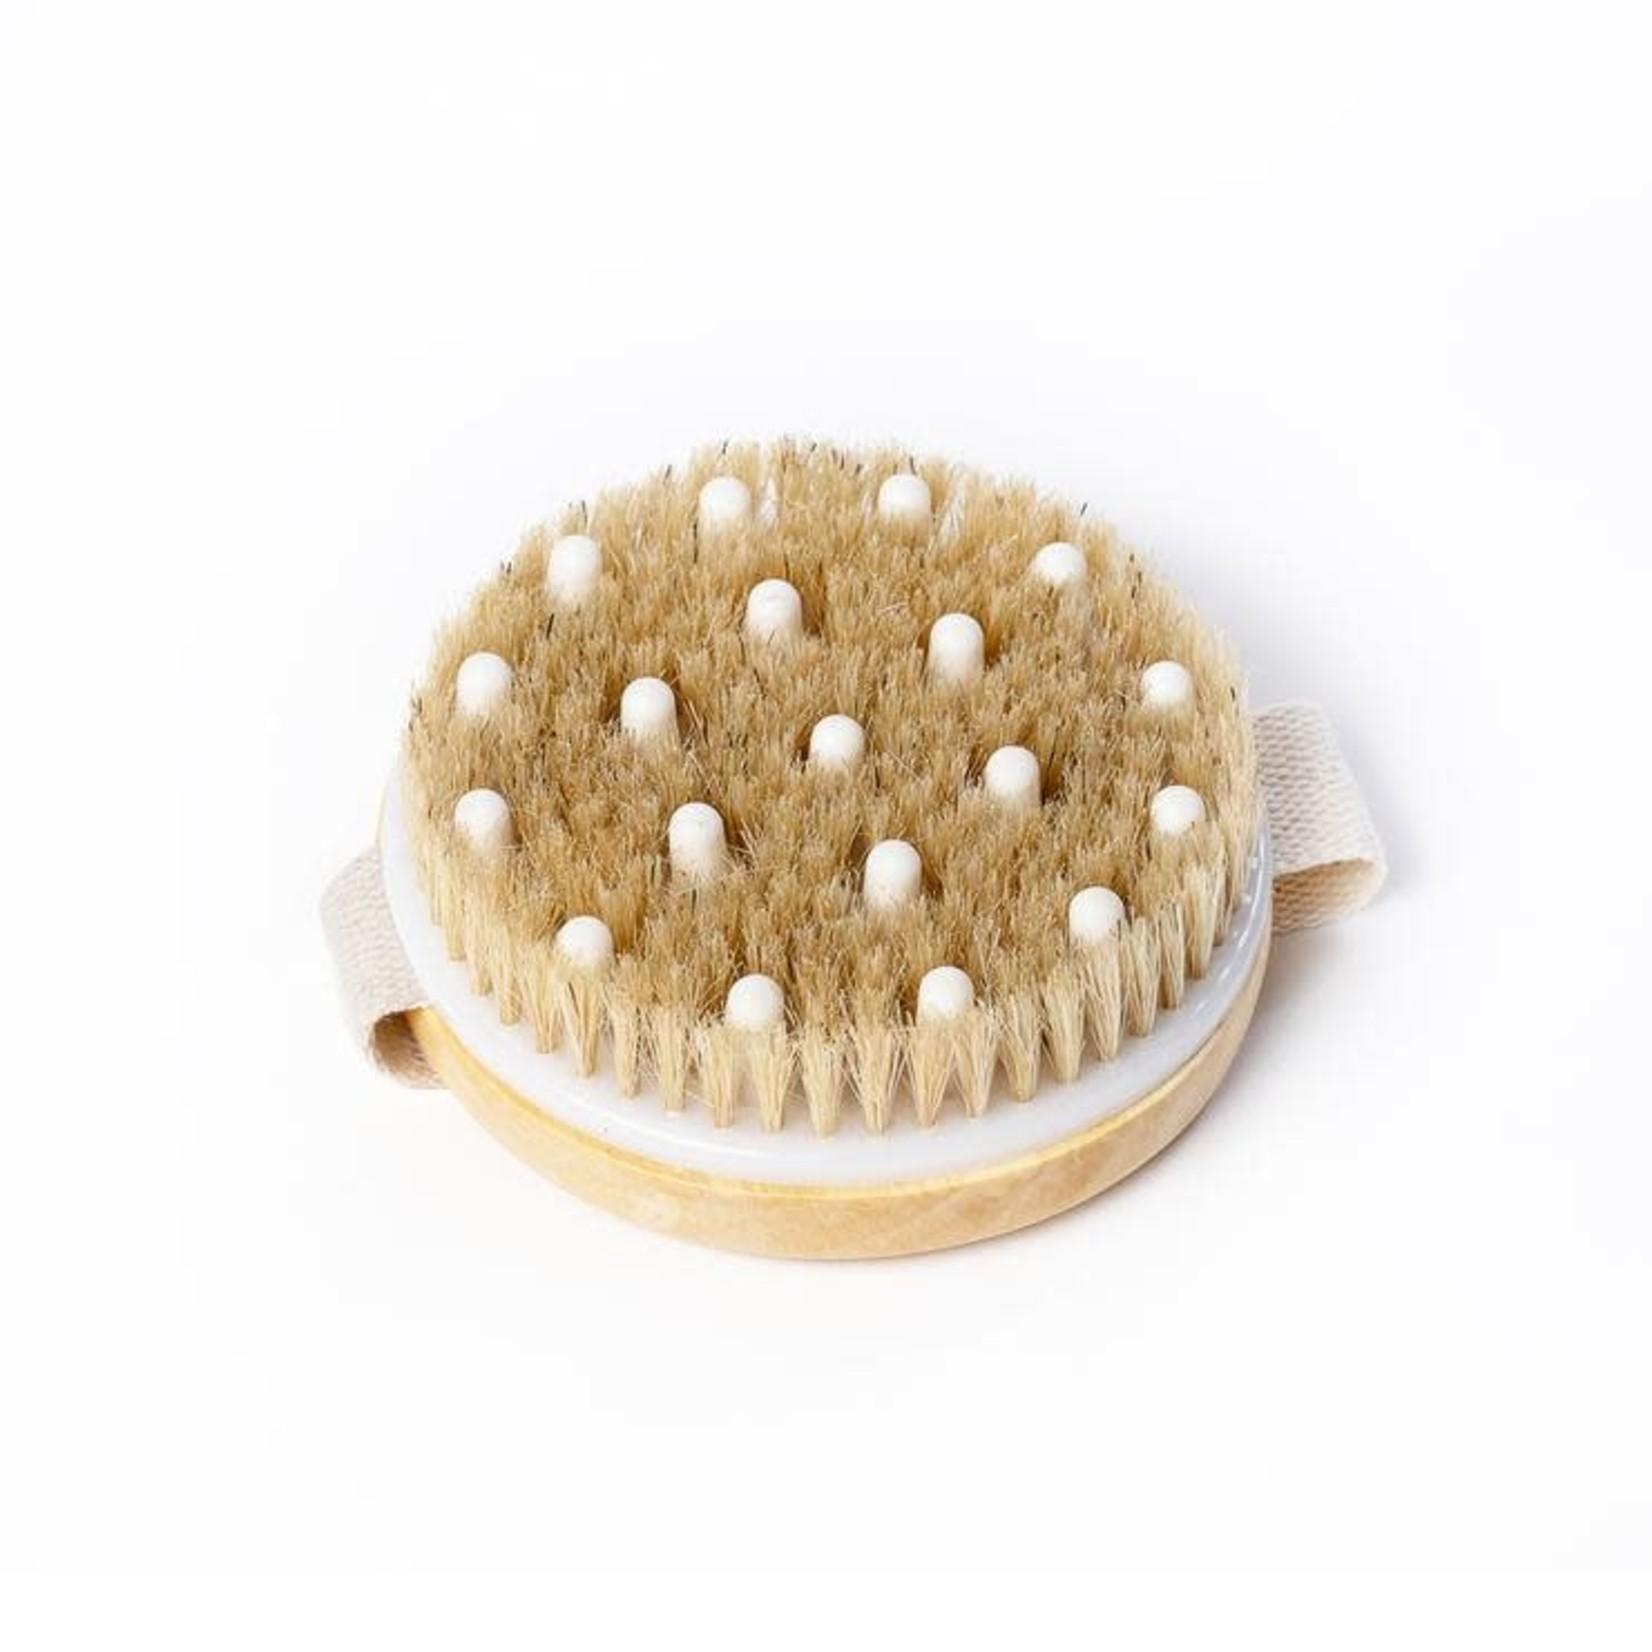 Cocoon Dry Body Brush